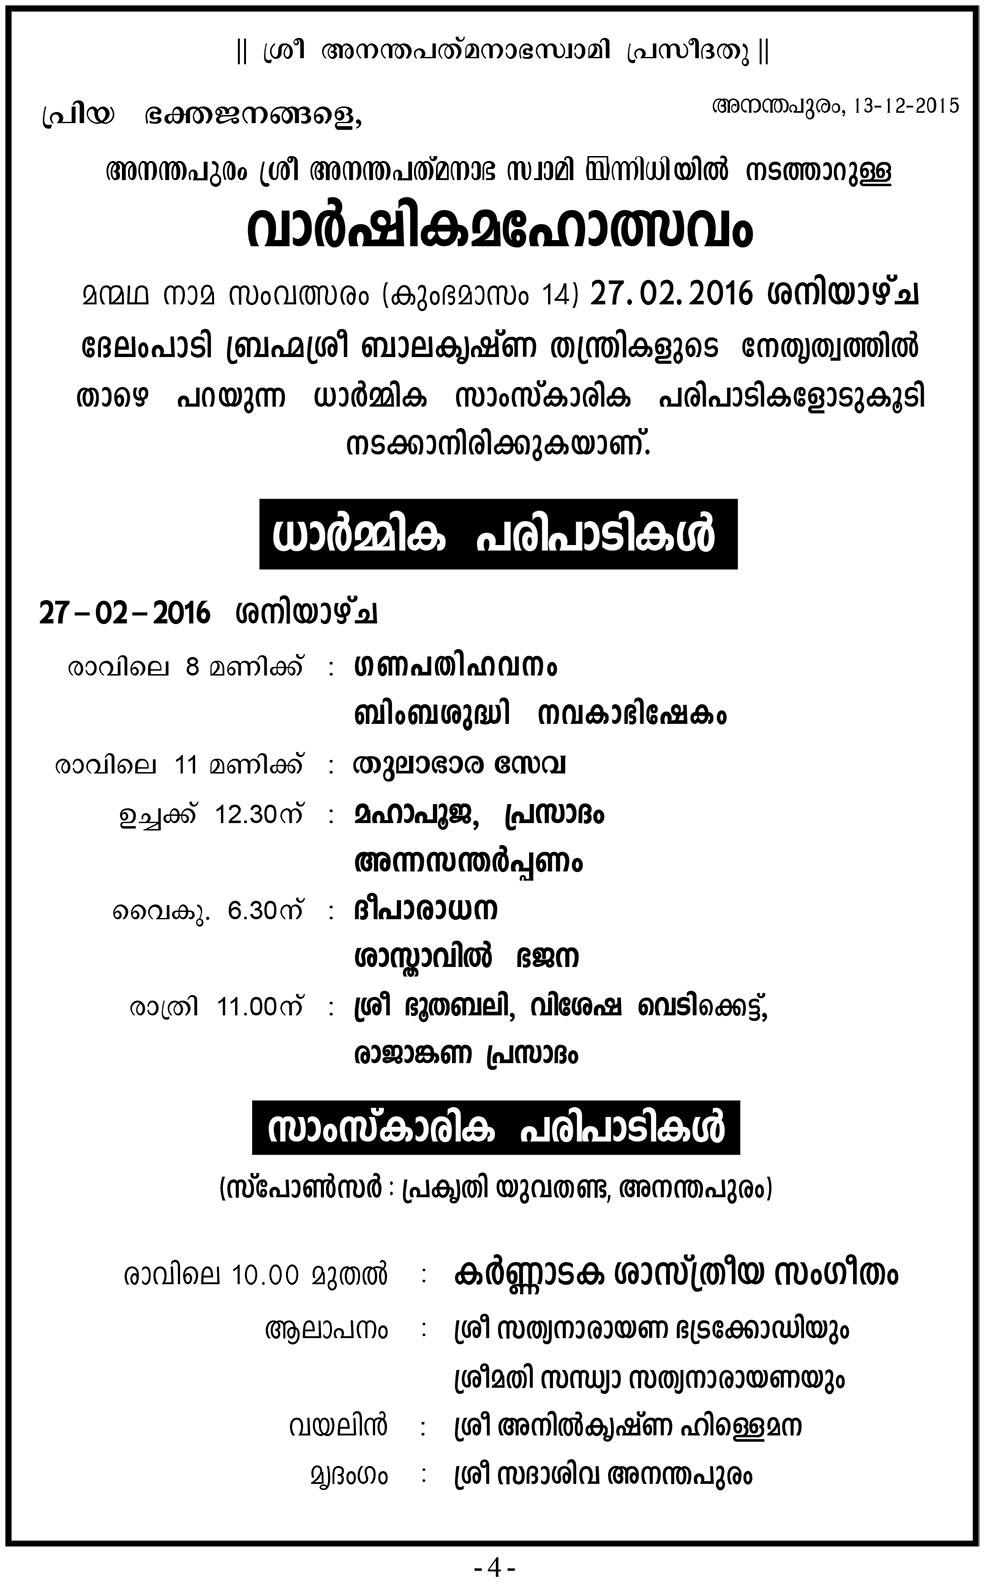 Varshika Mahothsava 2016.pmd